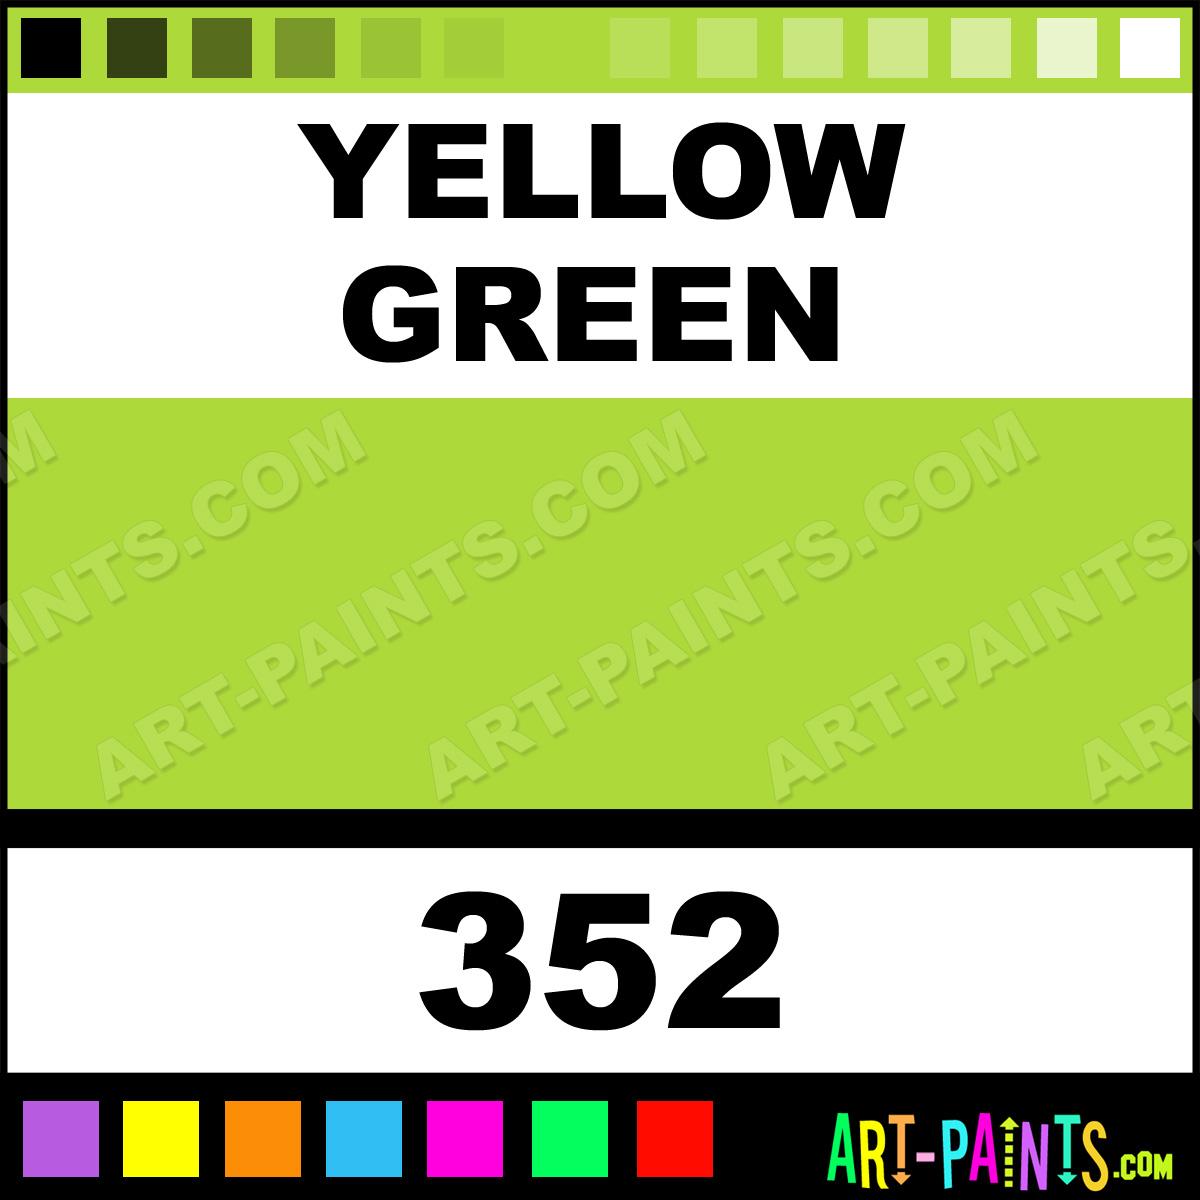 yellow green artist oil paints - 352 - yellow green paint, yellow